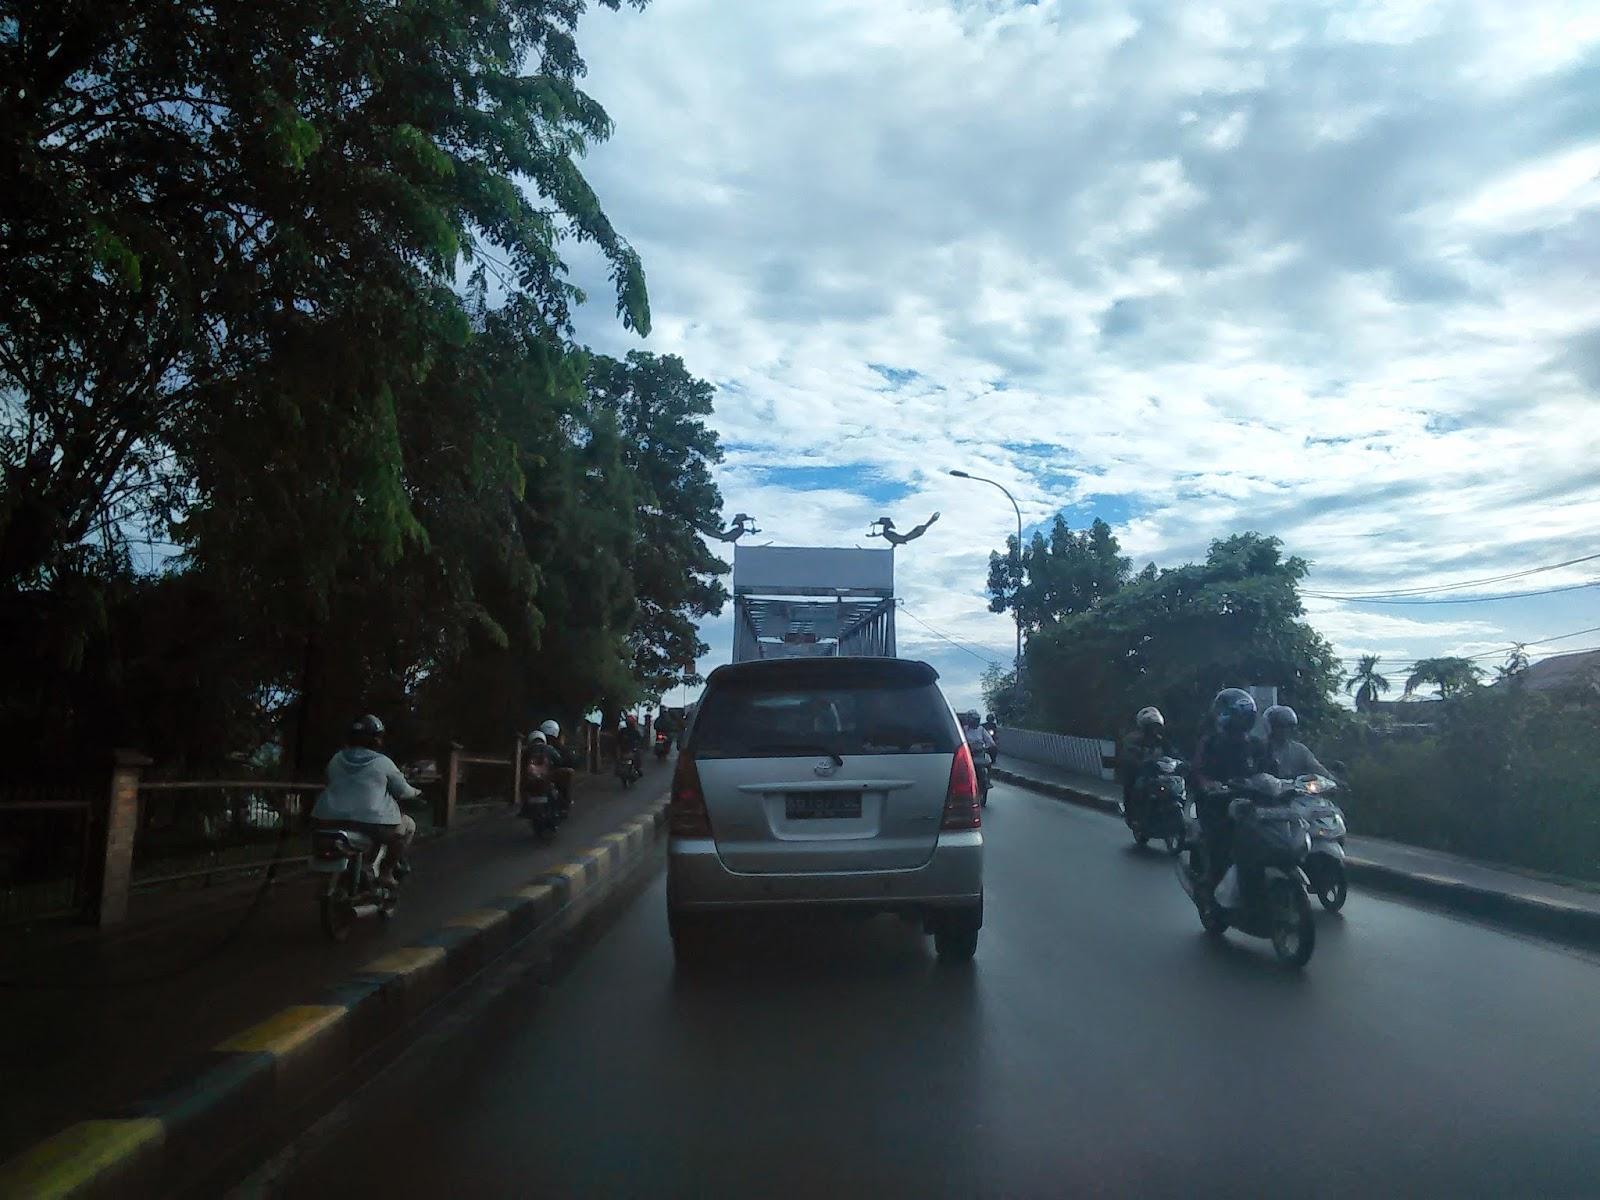 Melintasi Jambatan Sungai Kapuas Pontianak sebelum pulang ke Malaysia